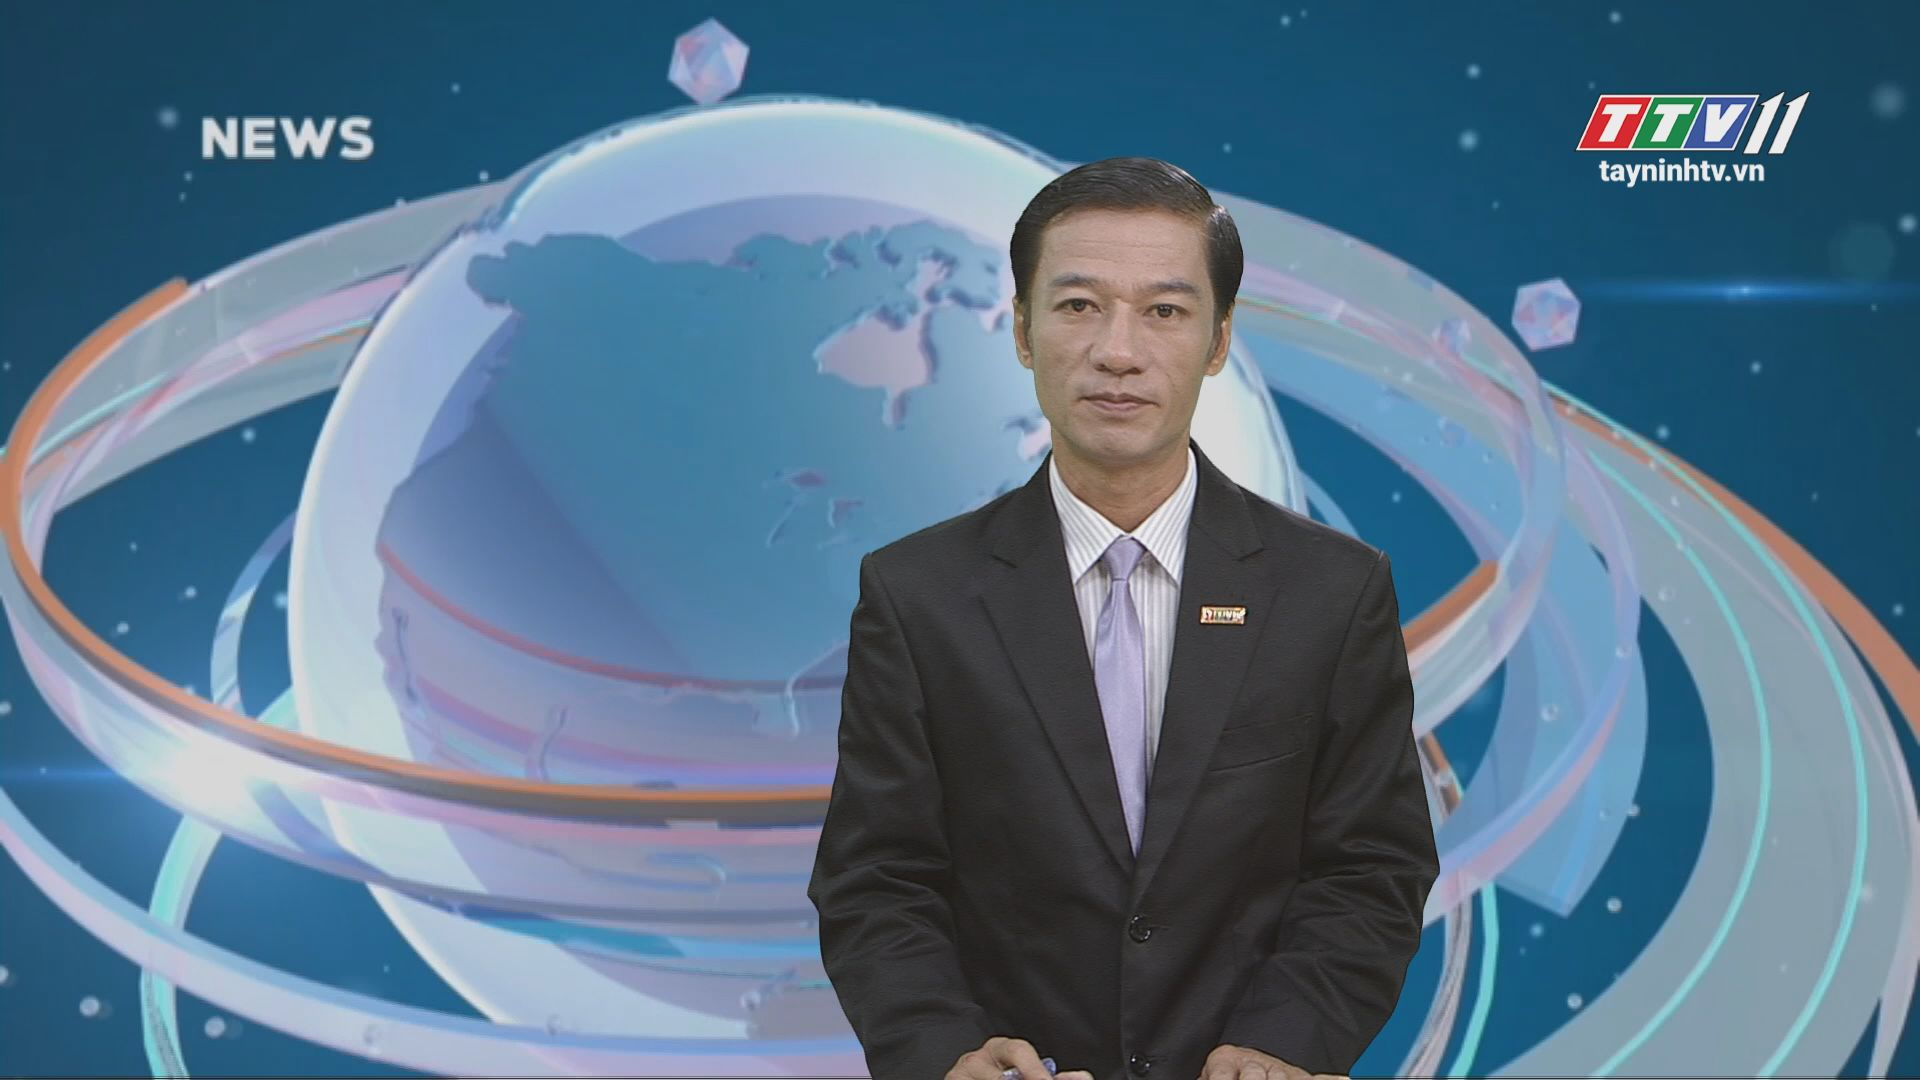 TTVNews 08-11-2019 | Today news | Tây Ninh TV